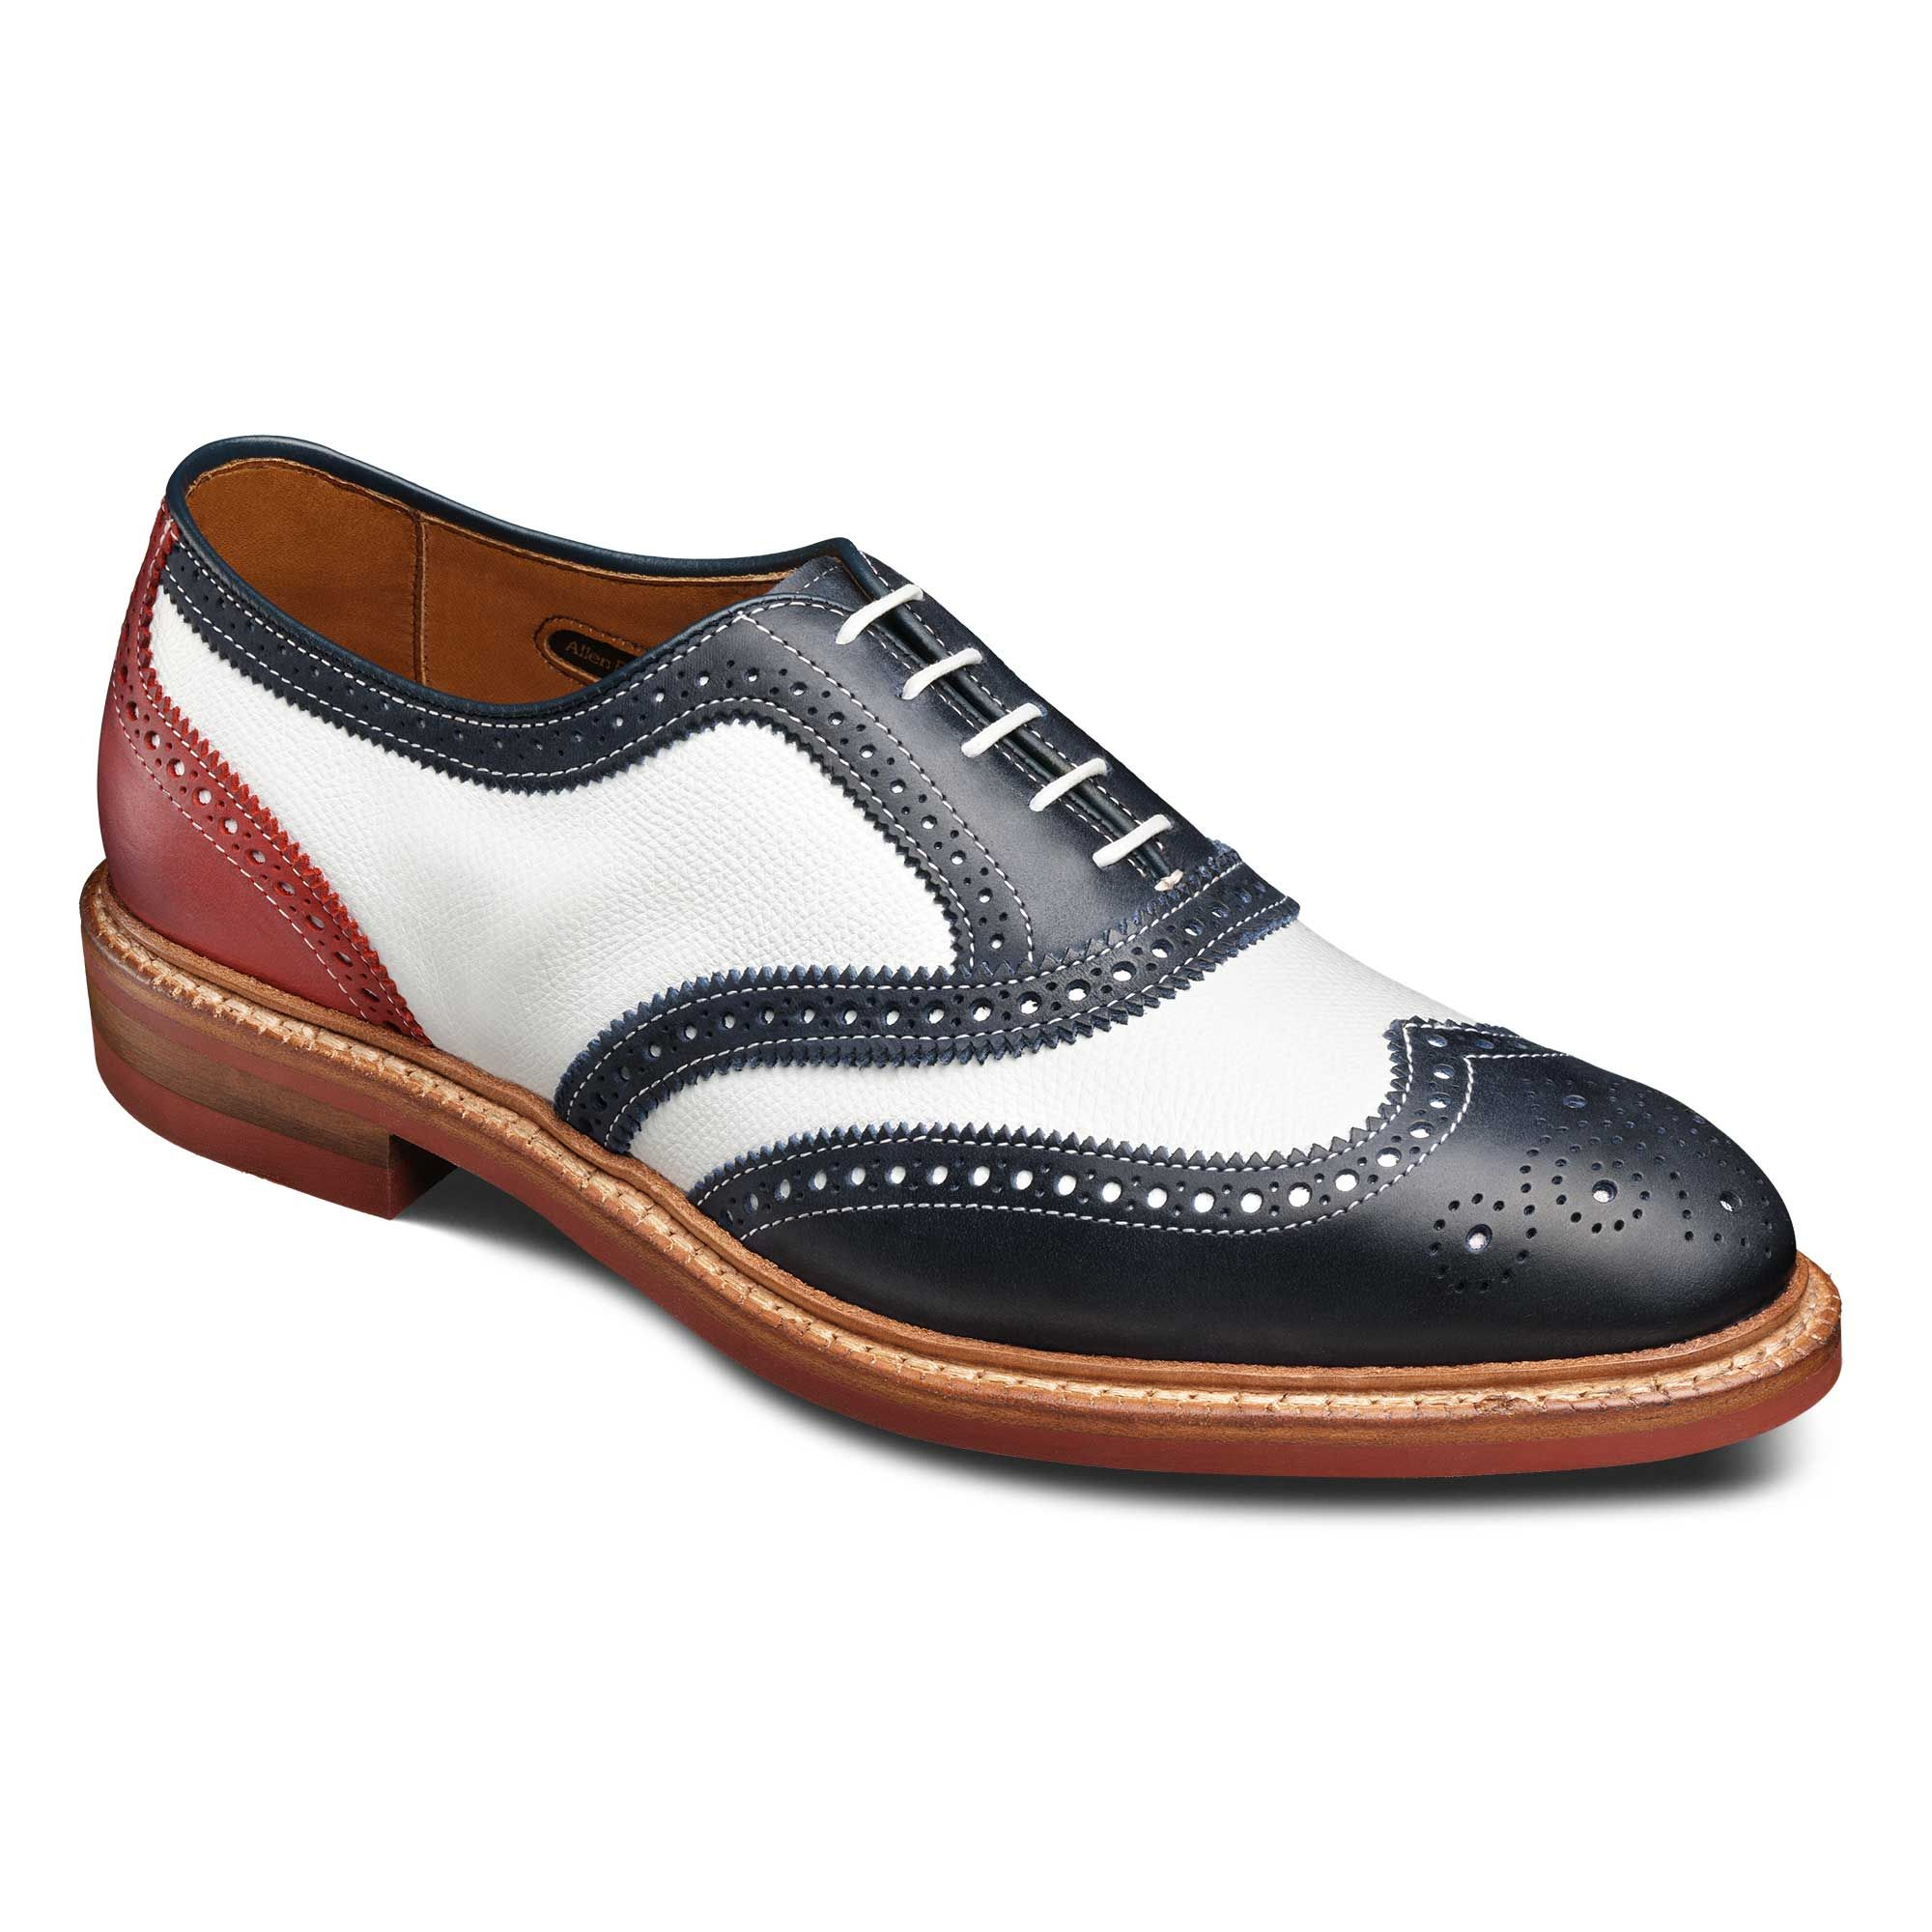 1776 Dress Shoe by Allen Edmonds Men s Shoes Dress b0437e41a530